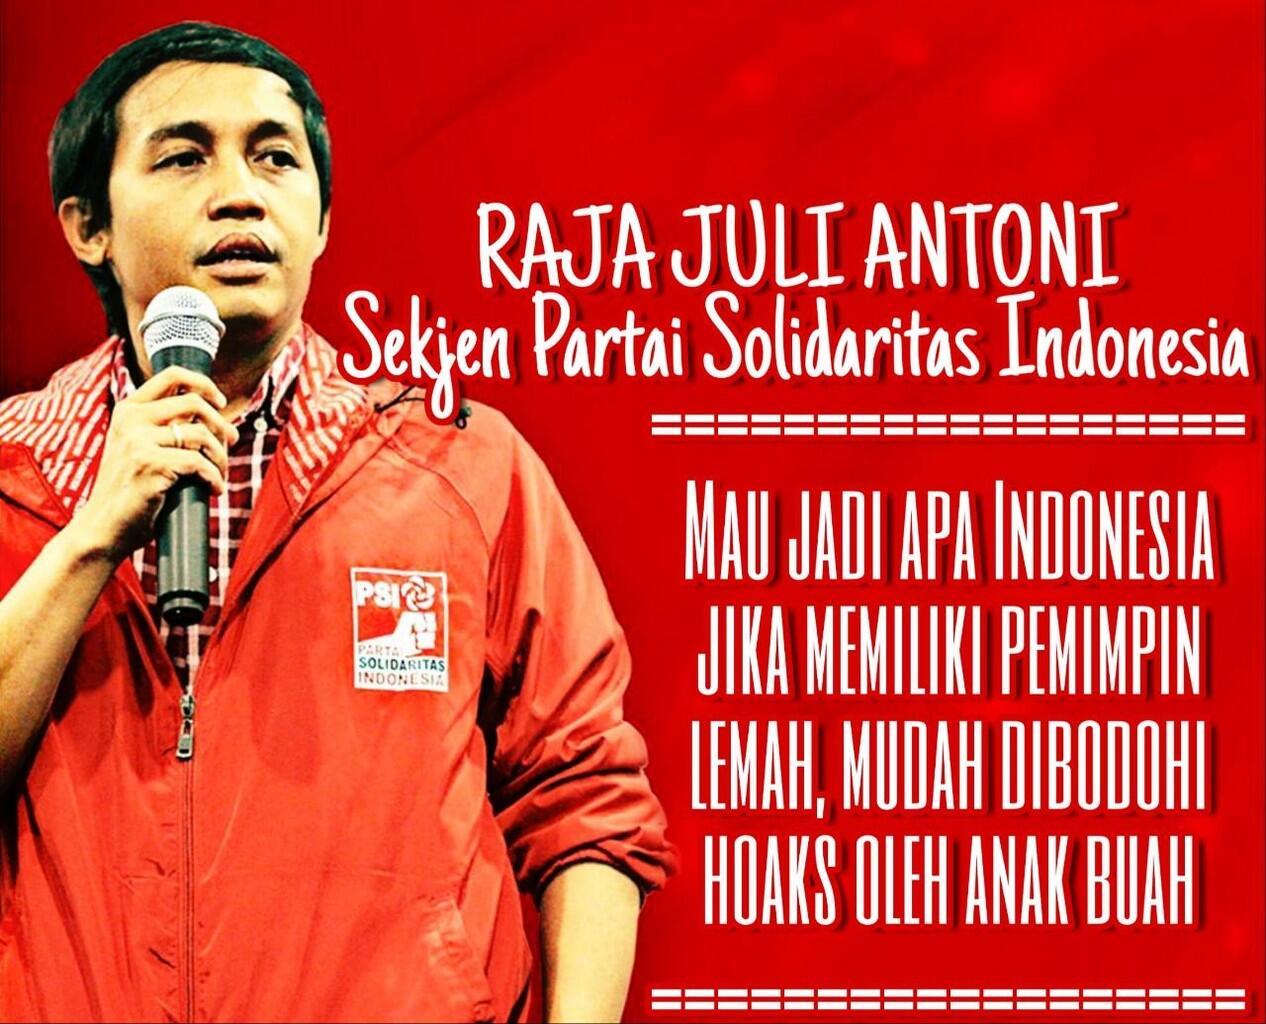 Praktik Politik Kubu Prabowo-Sandi dalam Kasus Hoax Ratna Sarumpaet Menghina Akal Seh